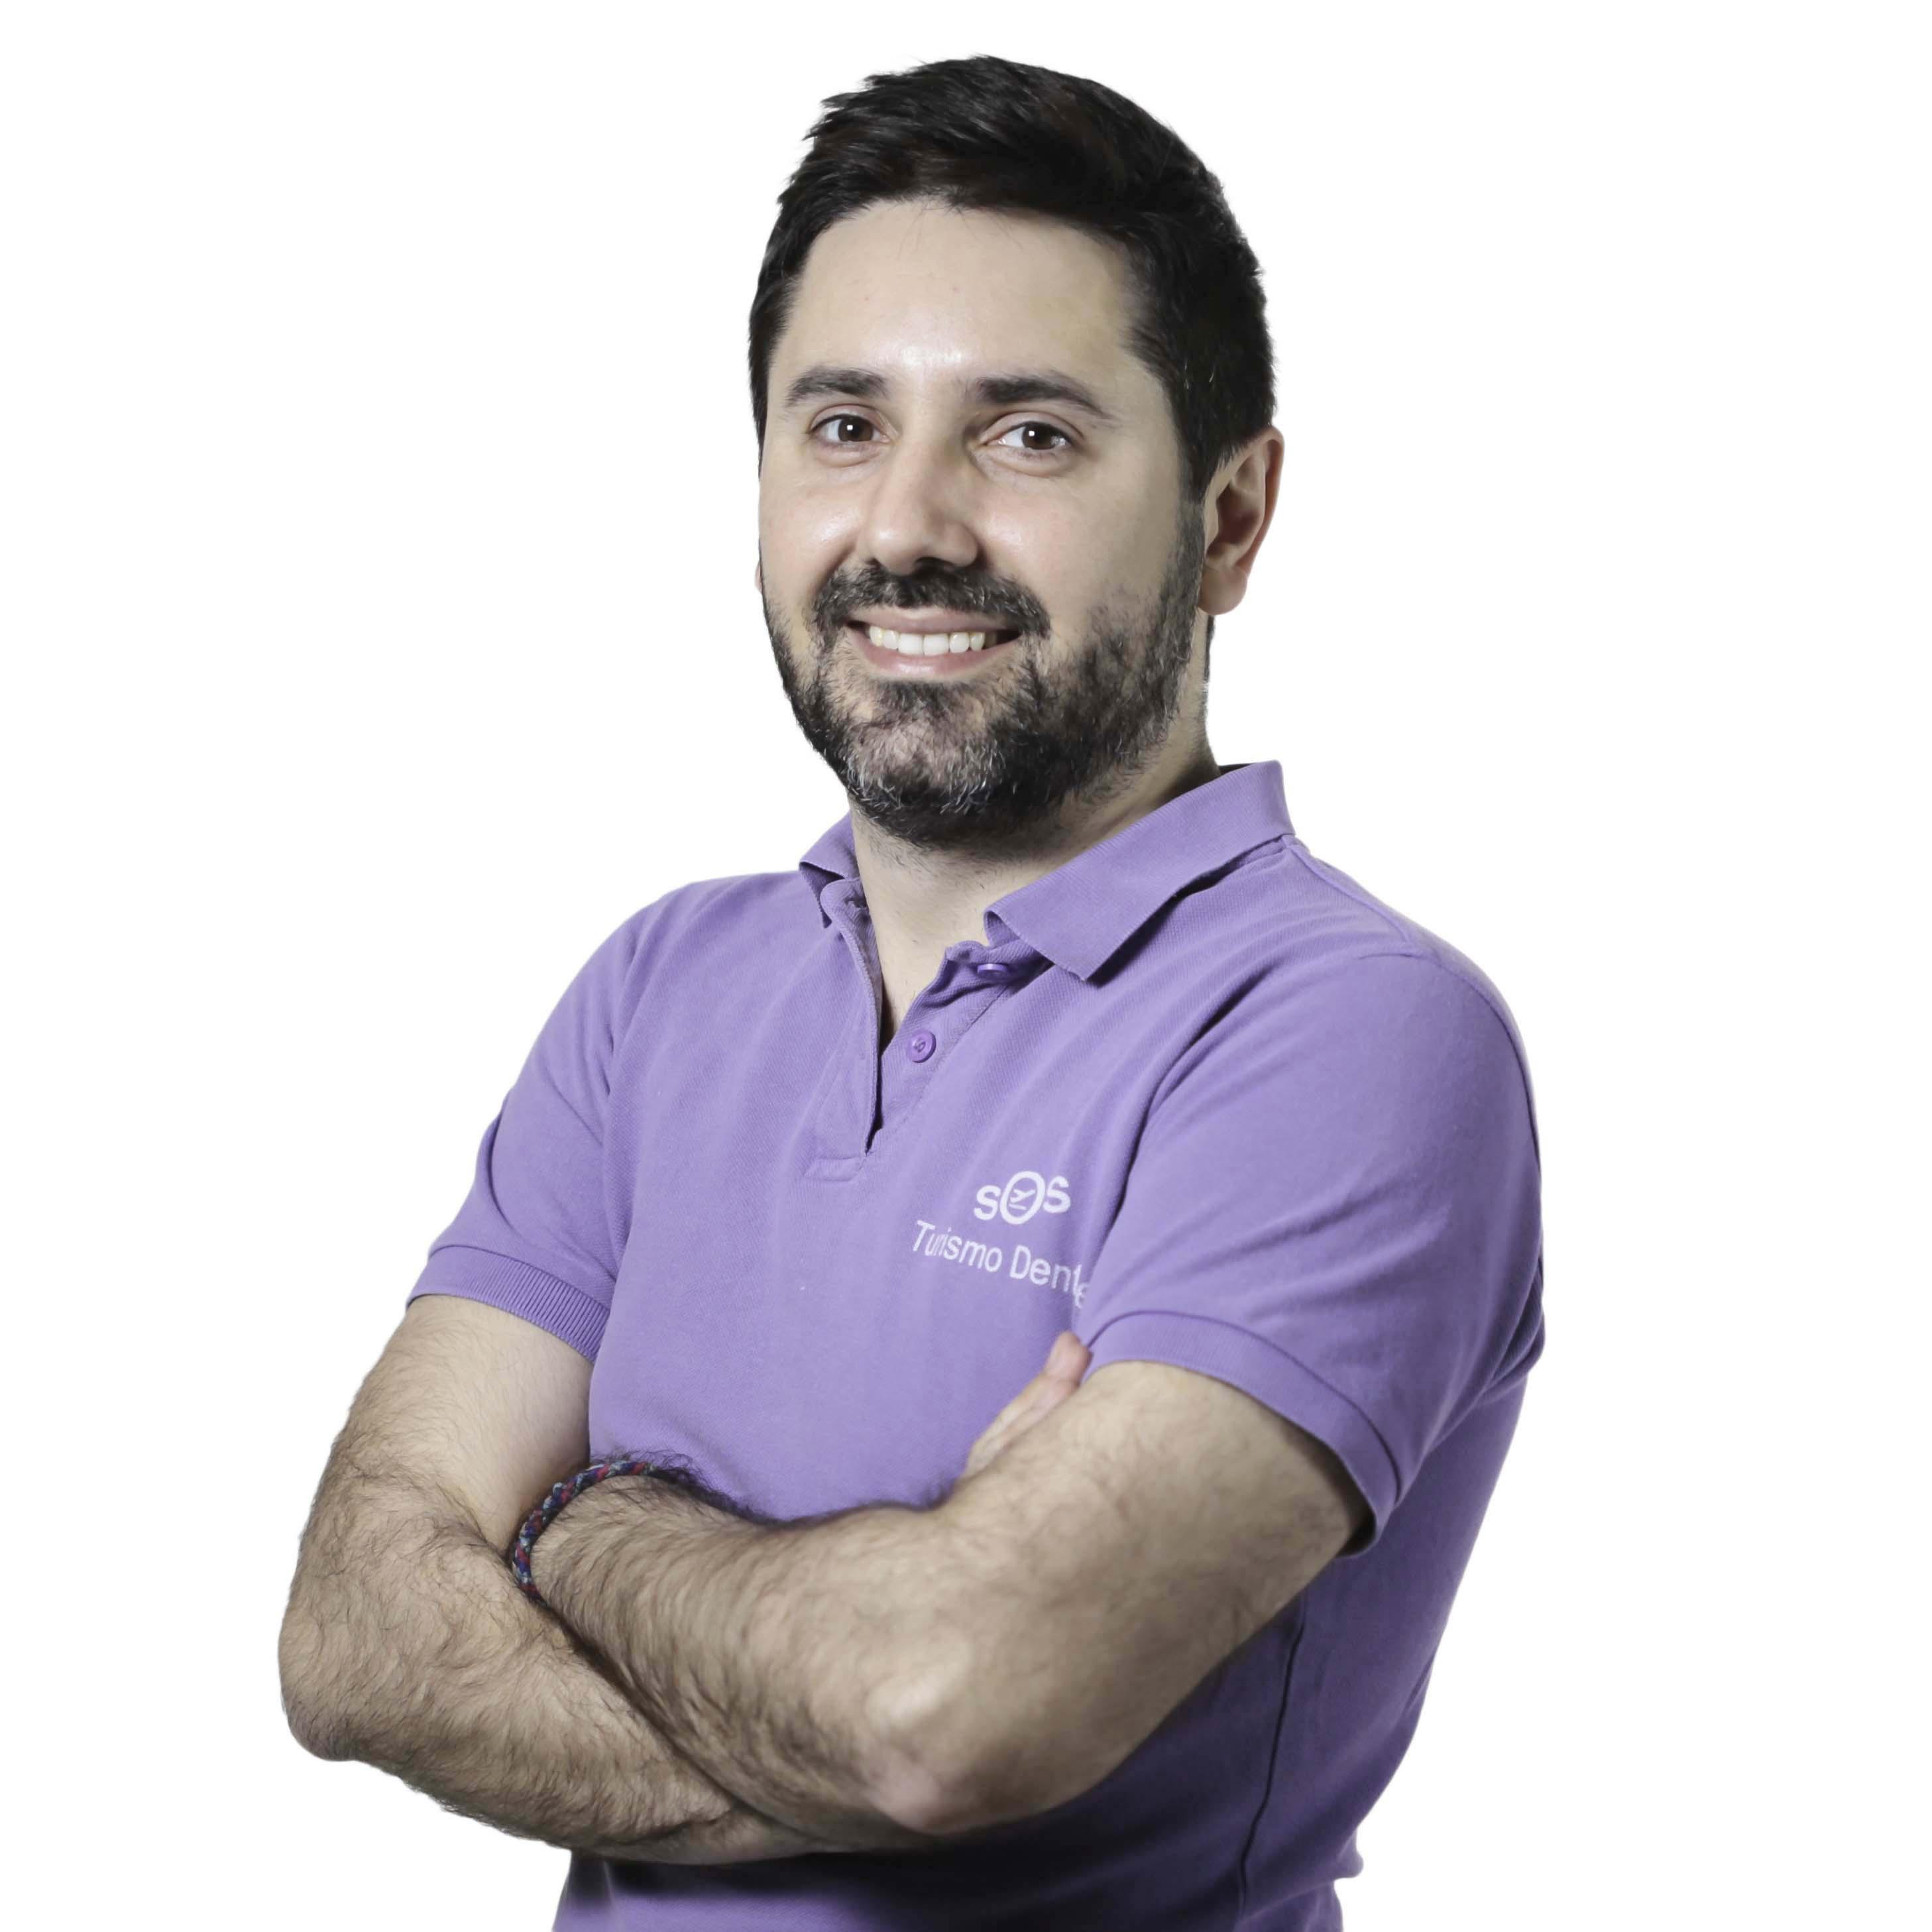 Dr. Palmas